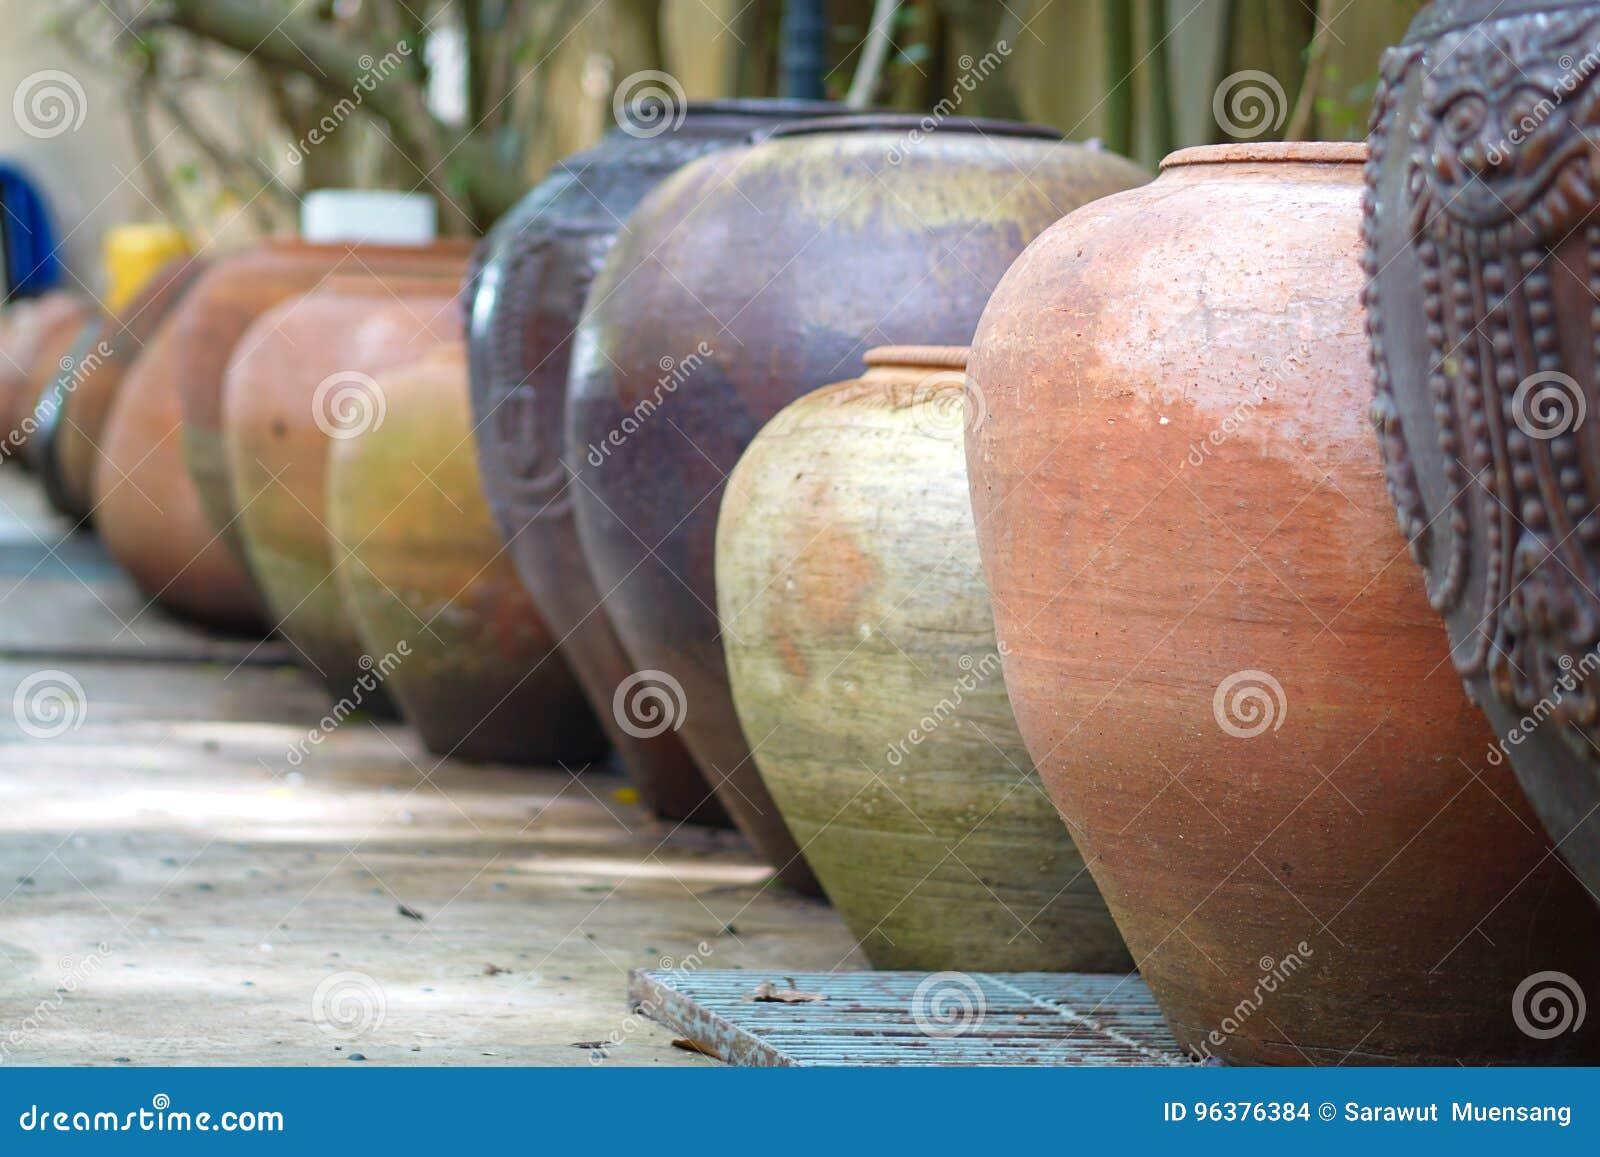 Earthenware handmade old clay pots